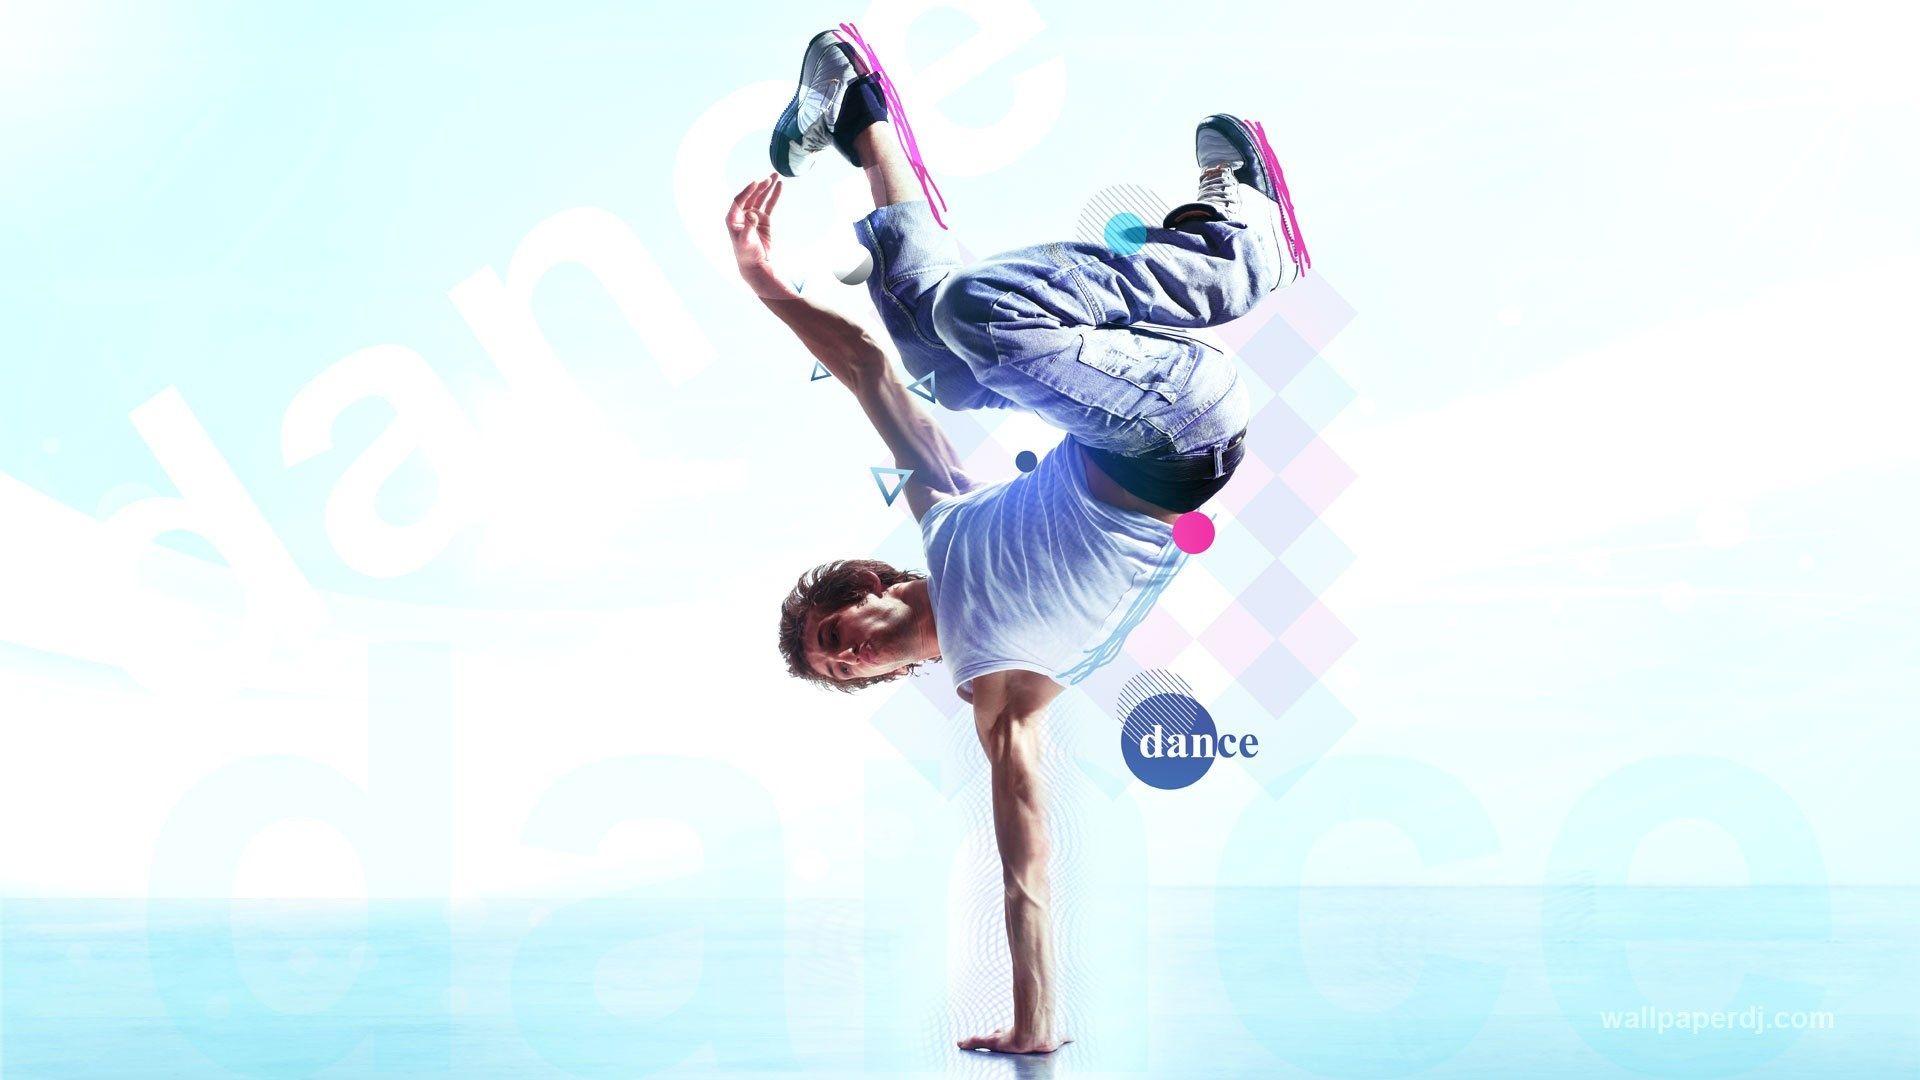 Hip hop dance hd wallpapers 1080p wallsjpg hip hop hd dance wallpapers 1080p sharovarka voltagebd Choice Image